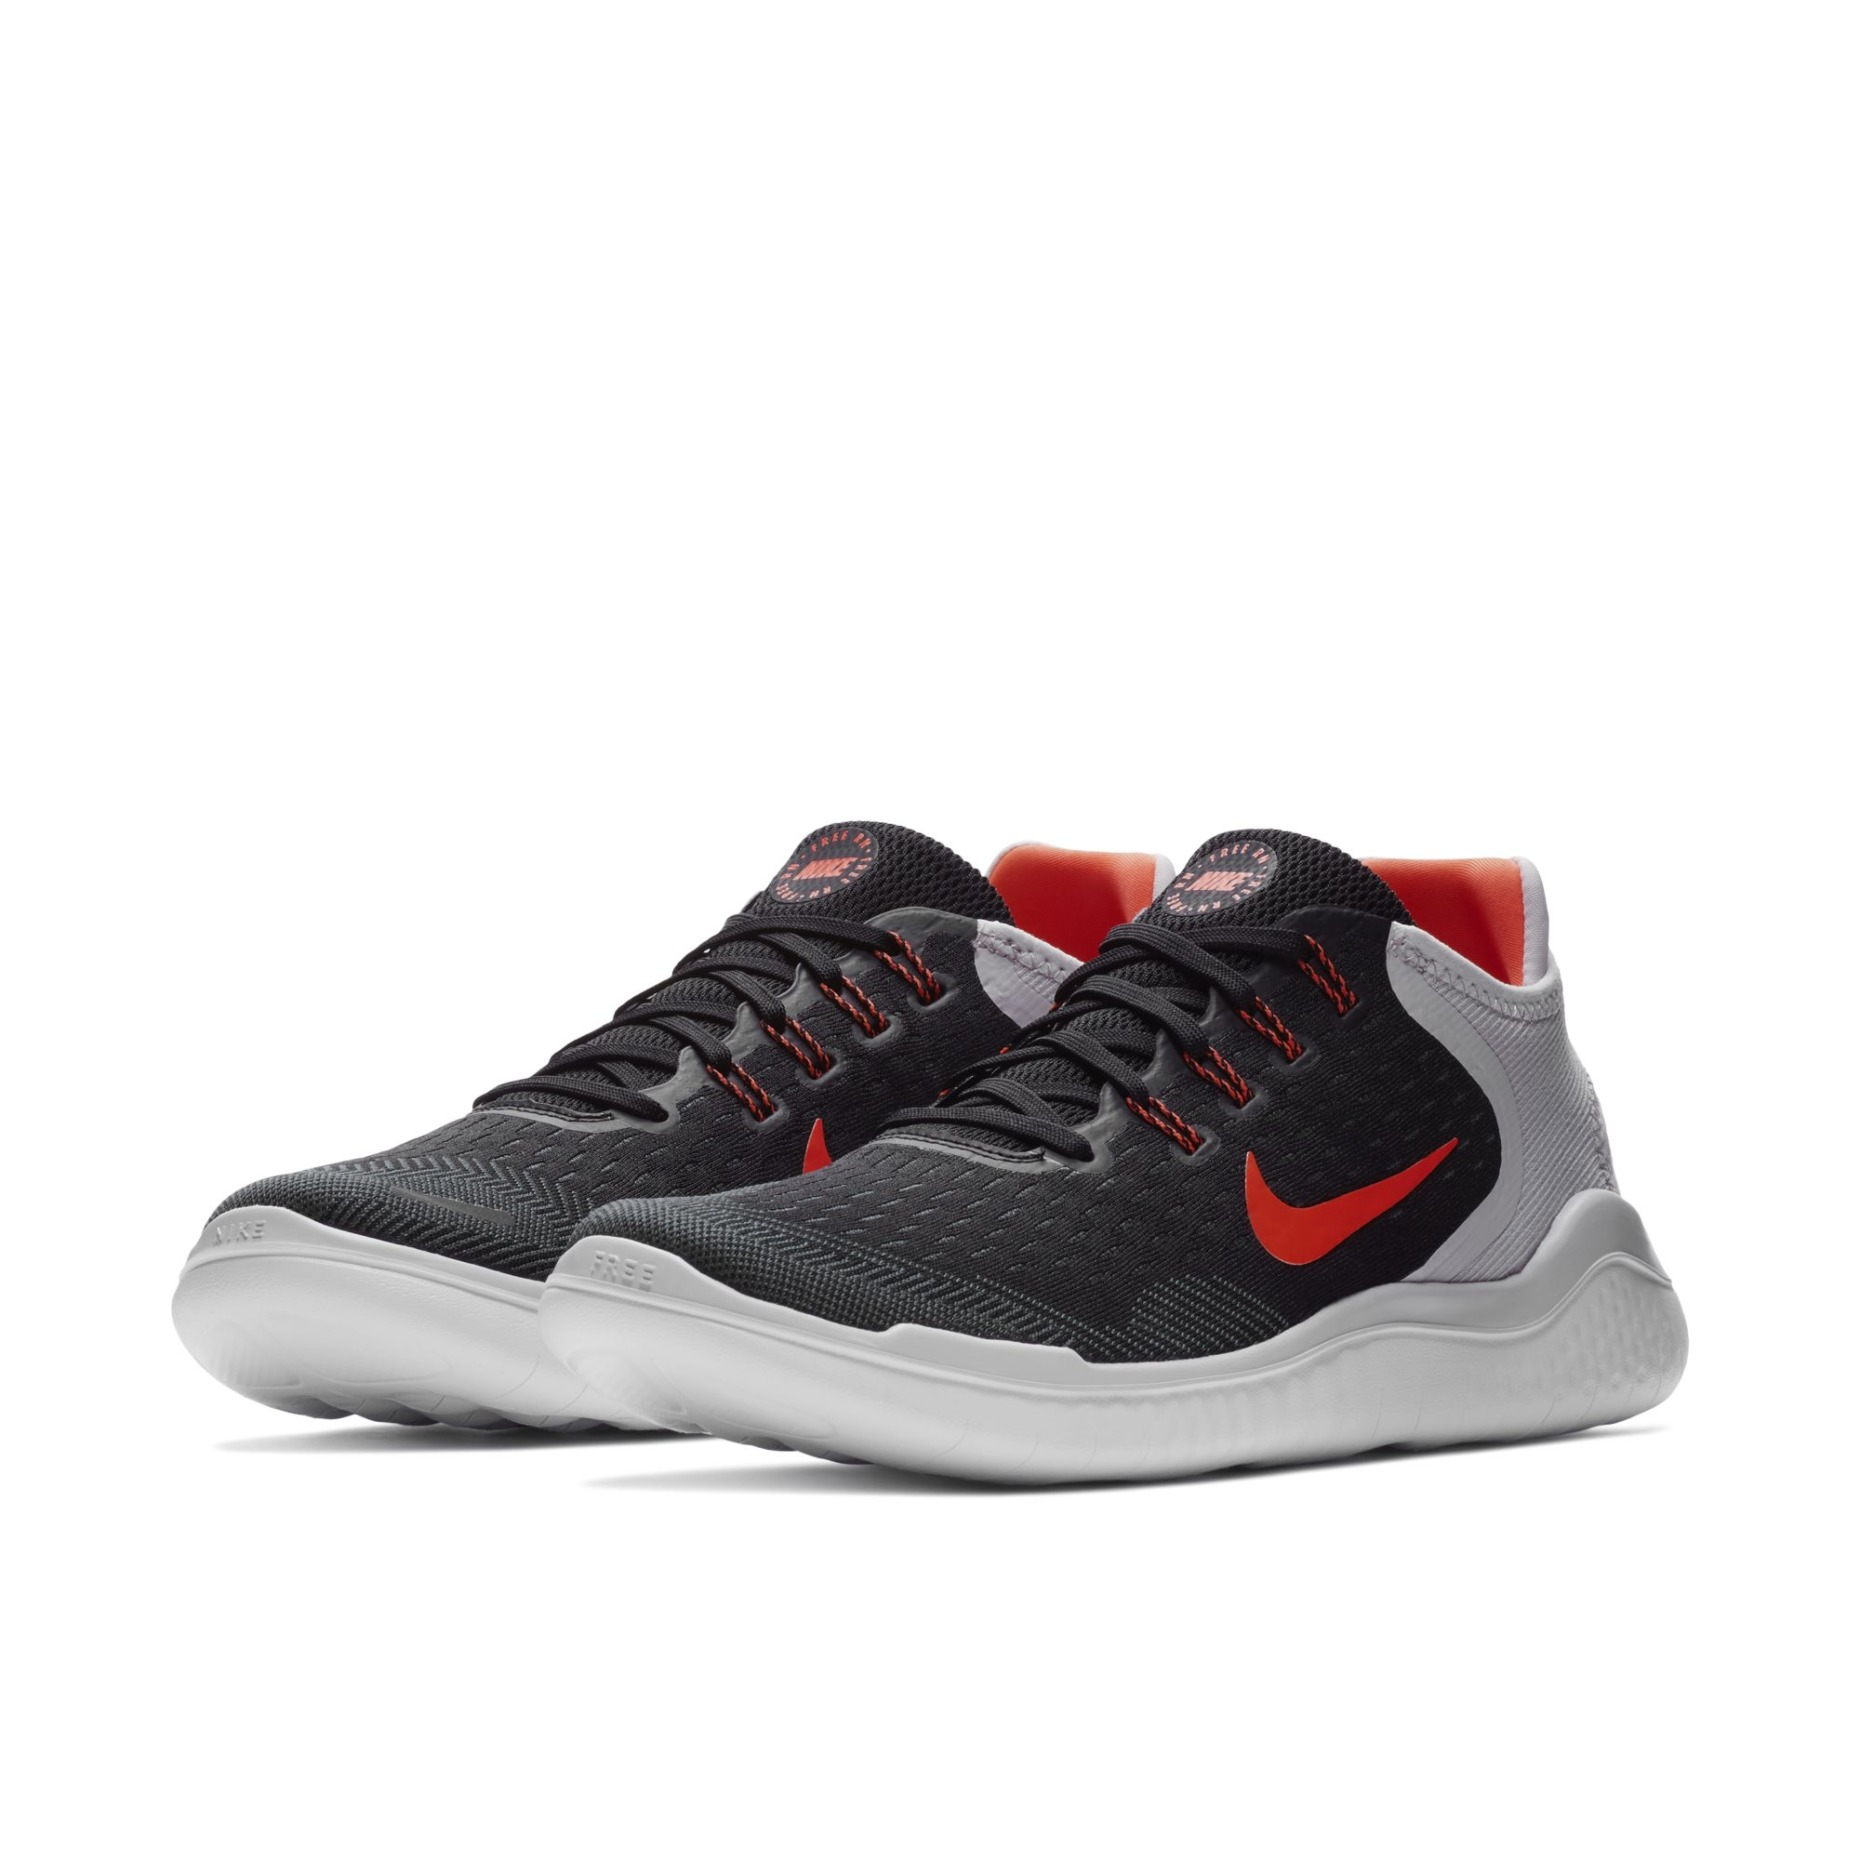 Nike Free Flyknit   Running Shoes Fa